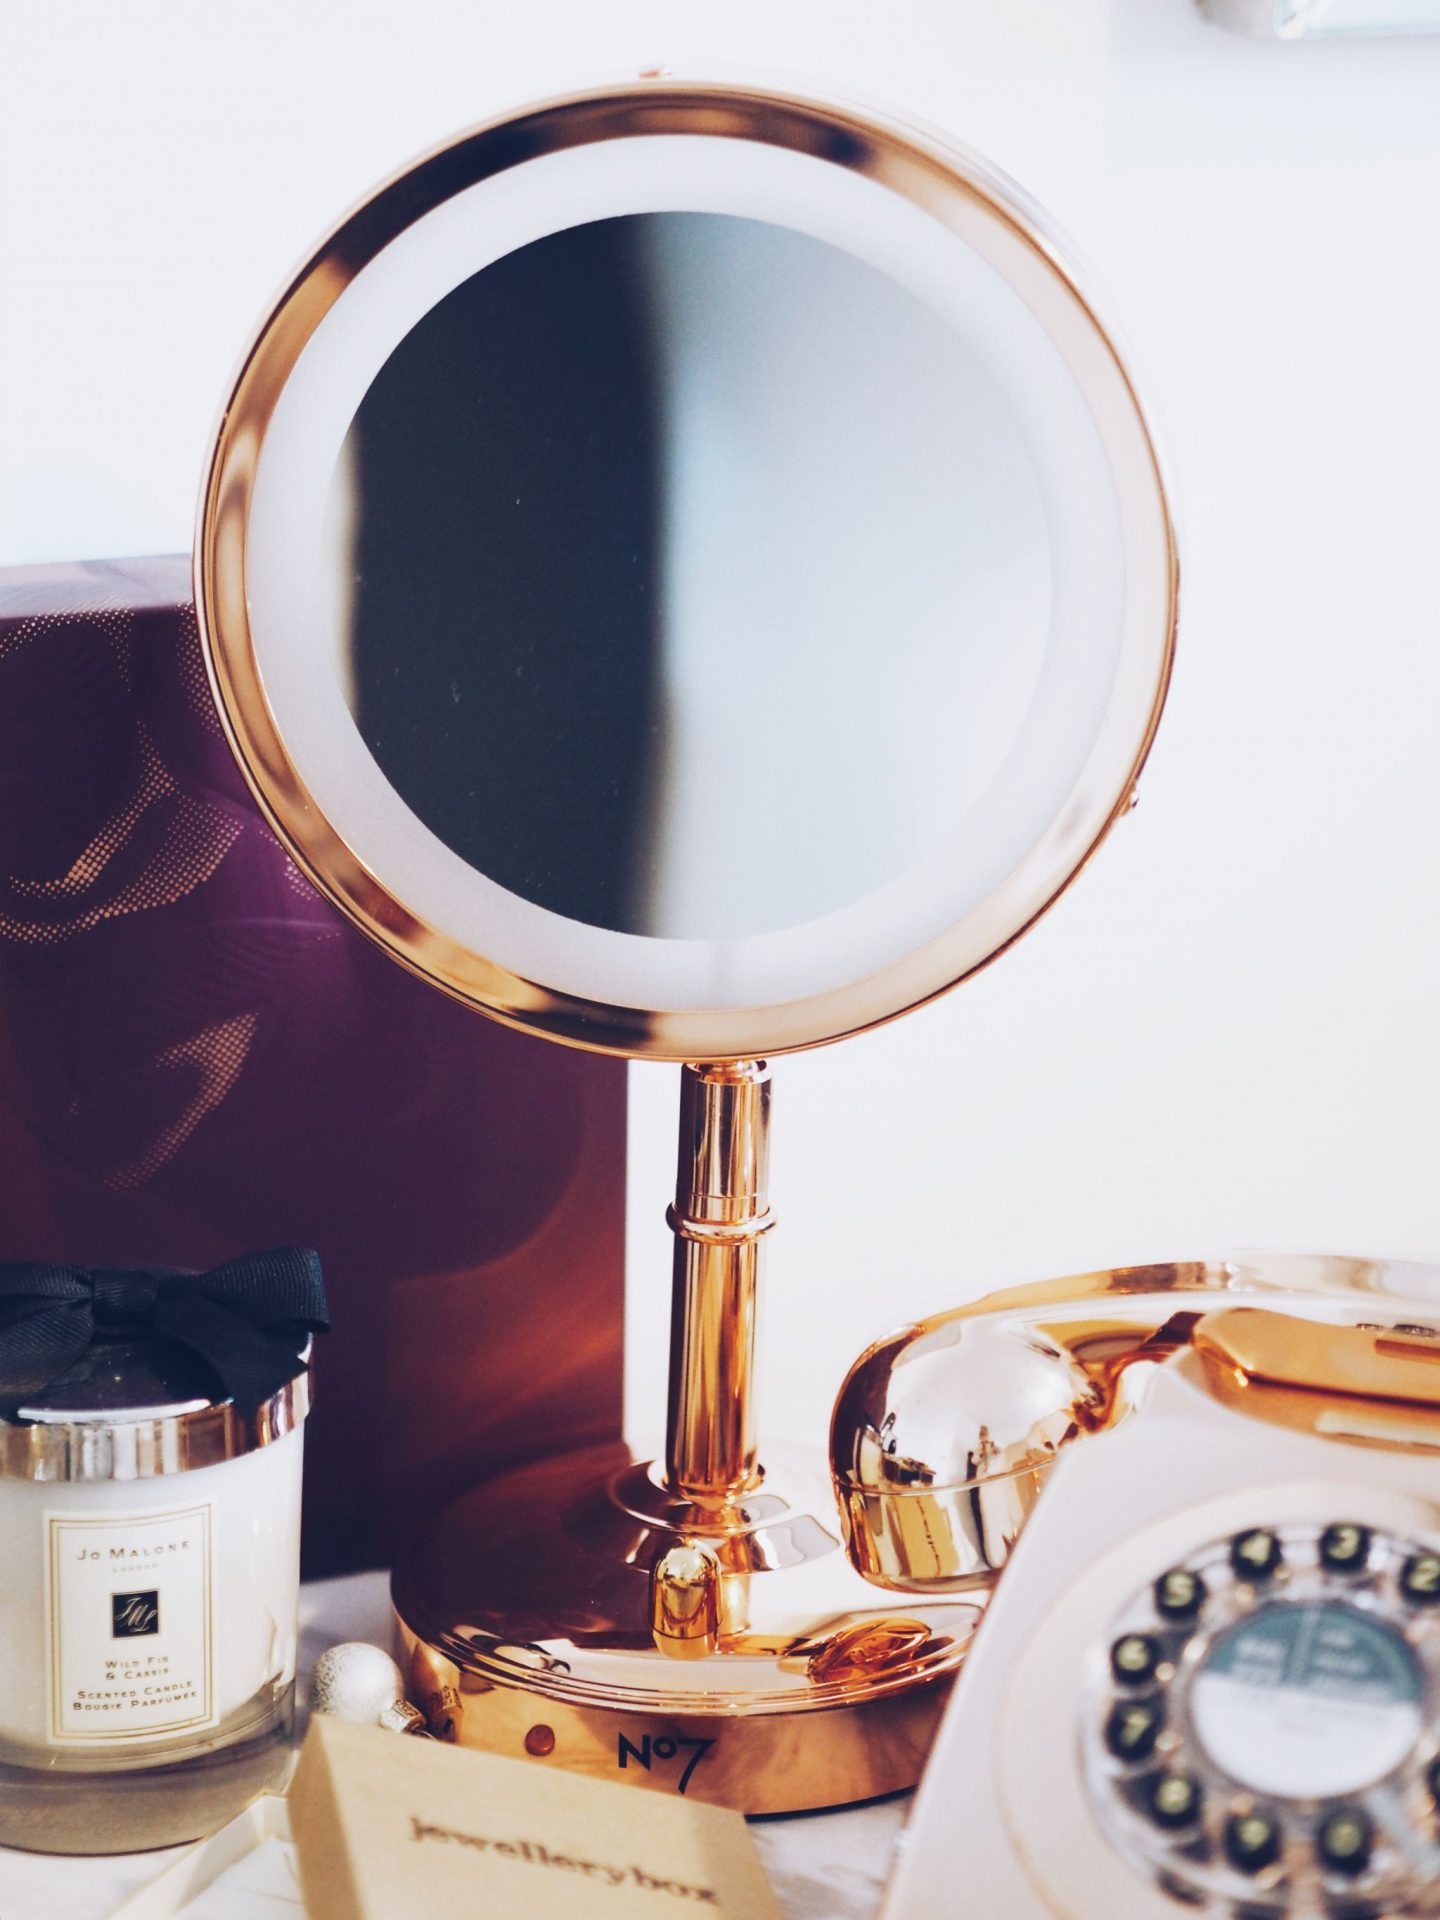 no7 rose gold illuminating mirror